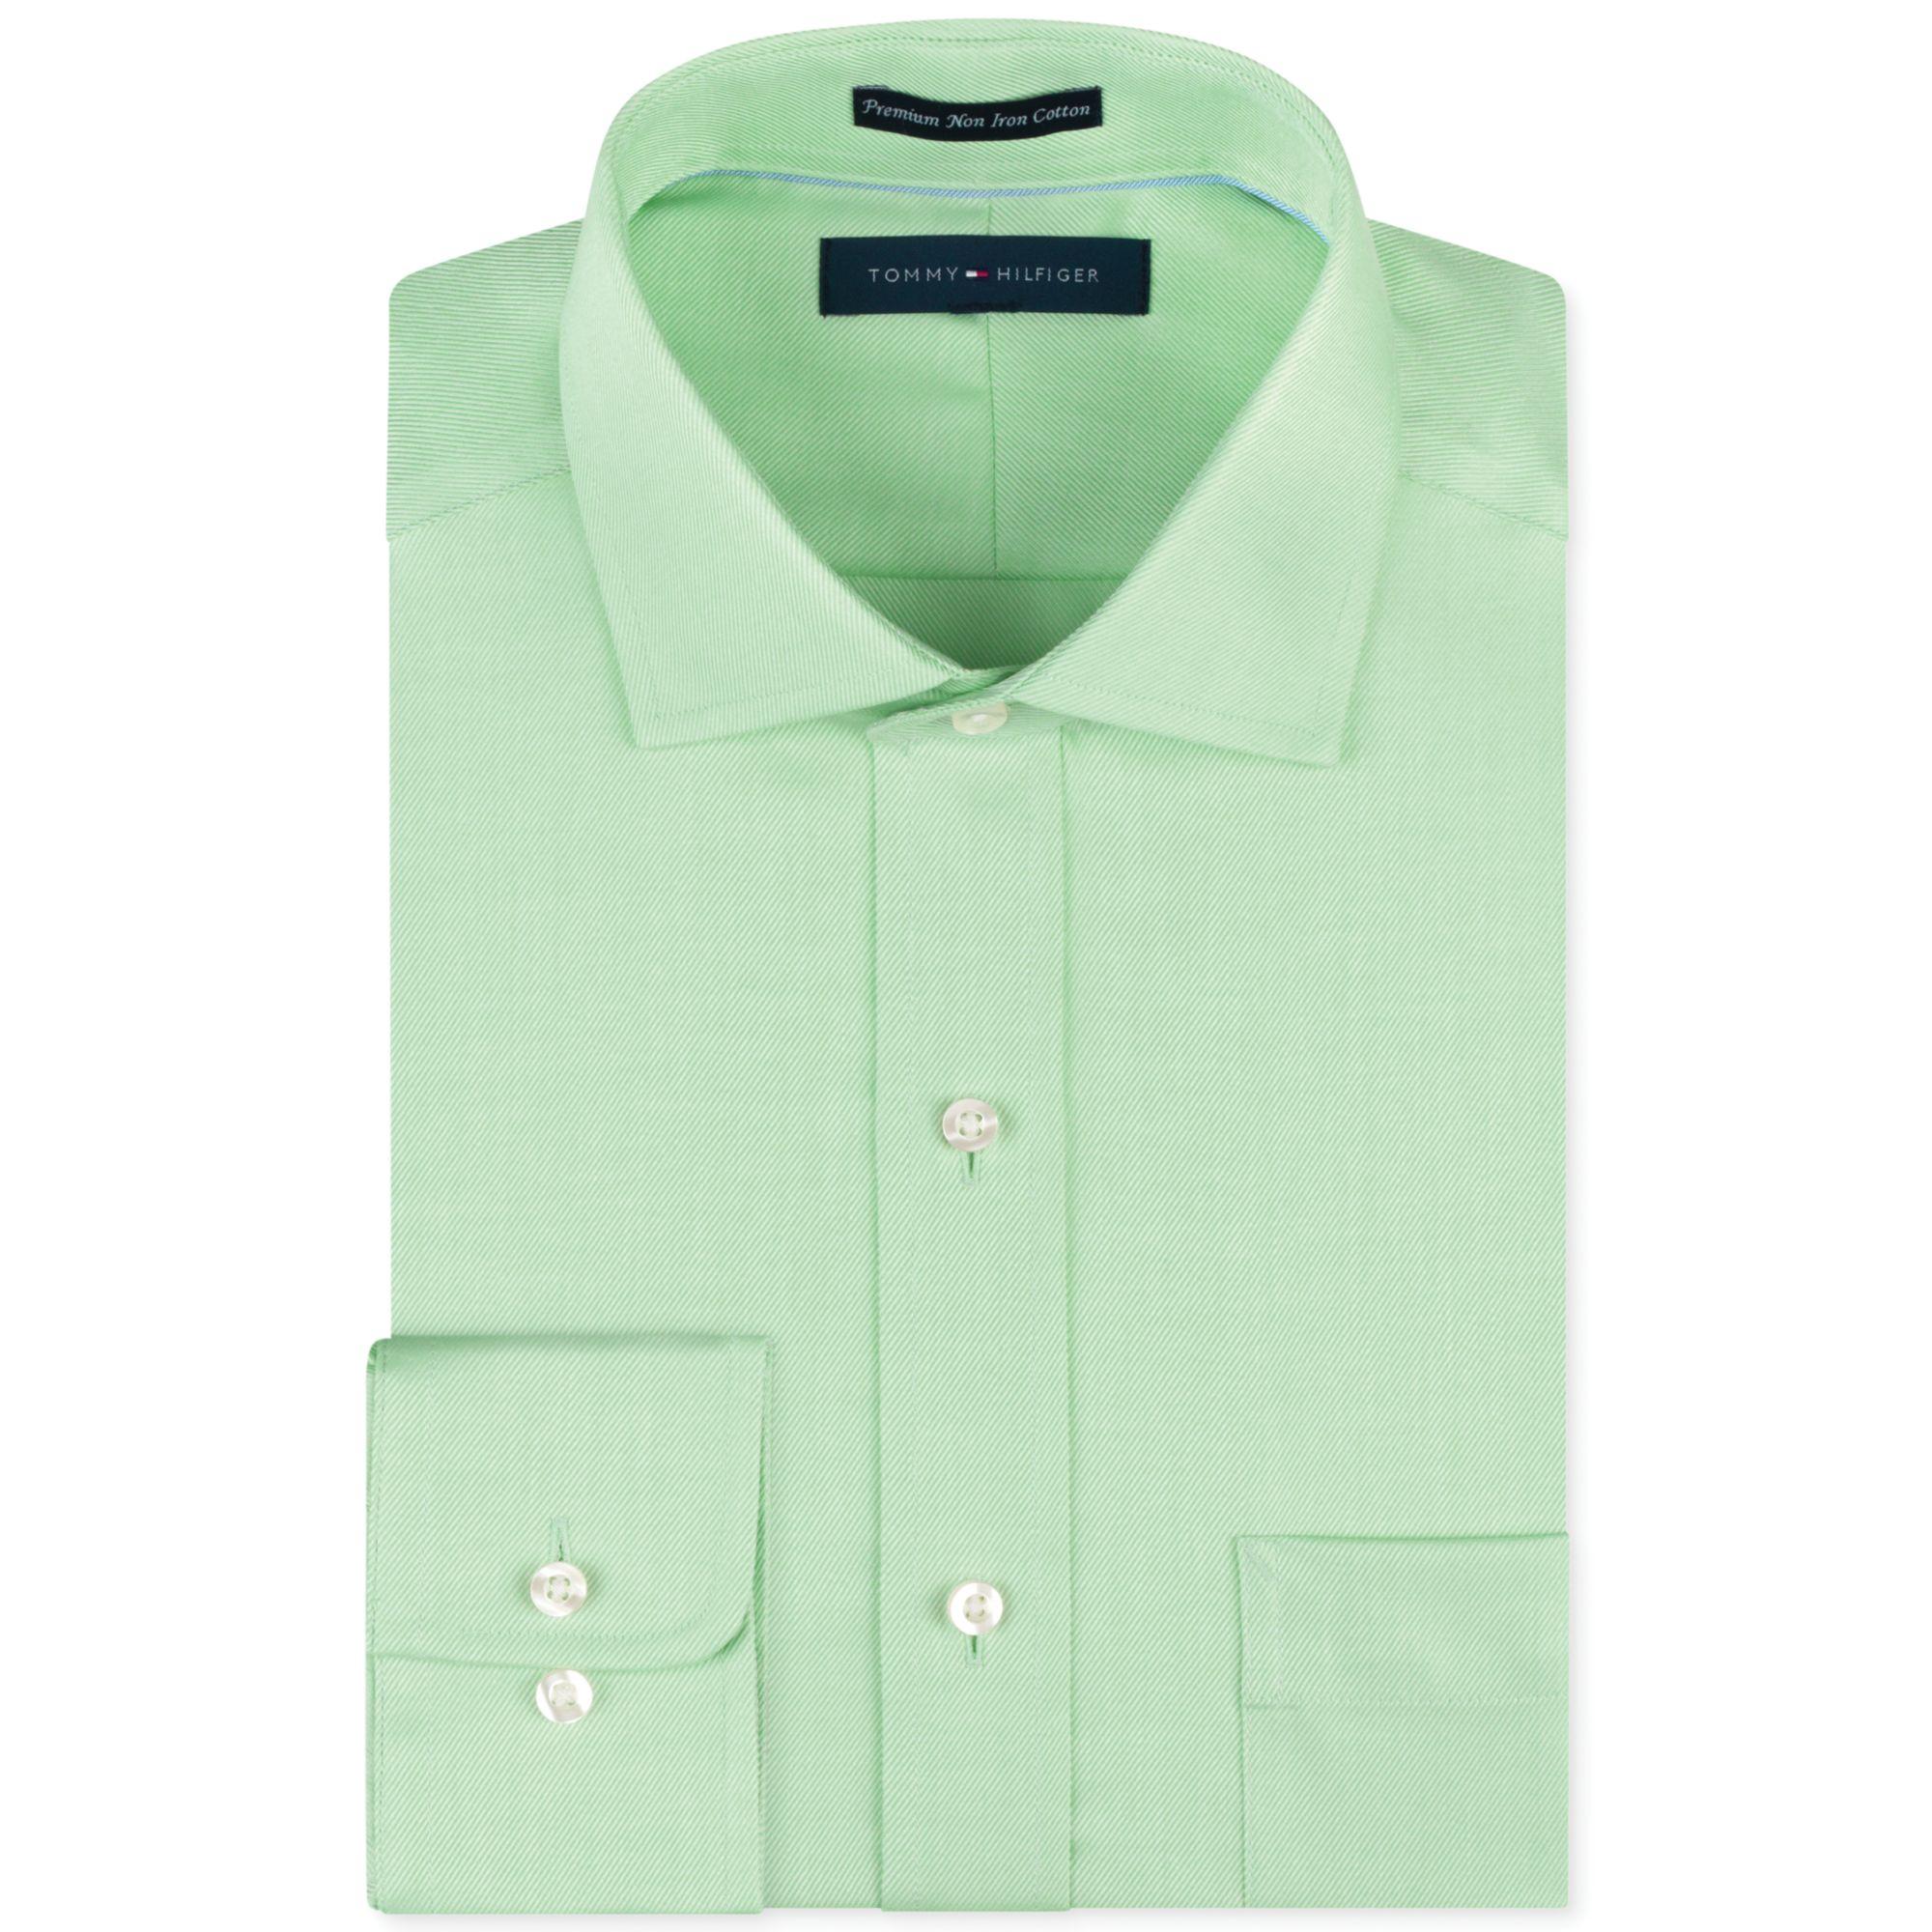 Tommy Hilfiger Noniron Light Green Solid Dress Shirt In